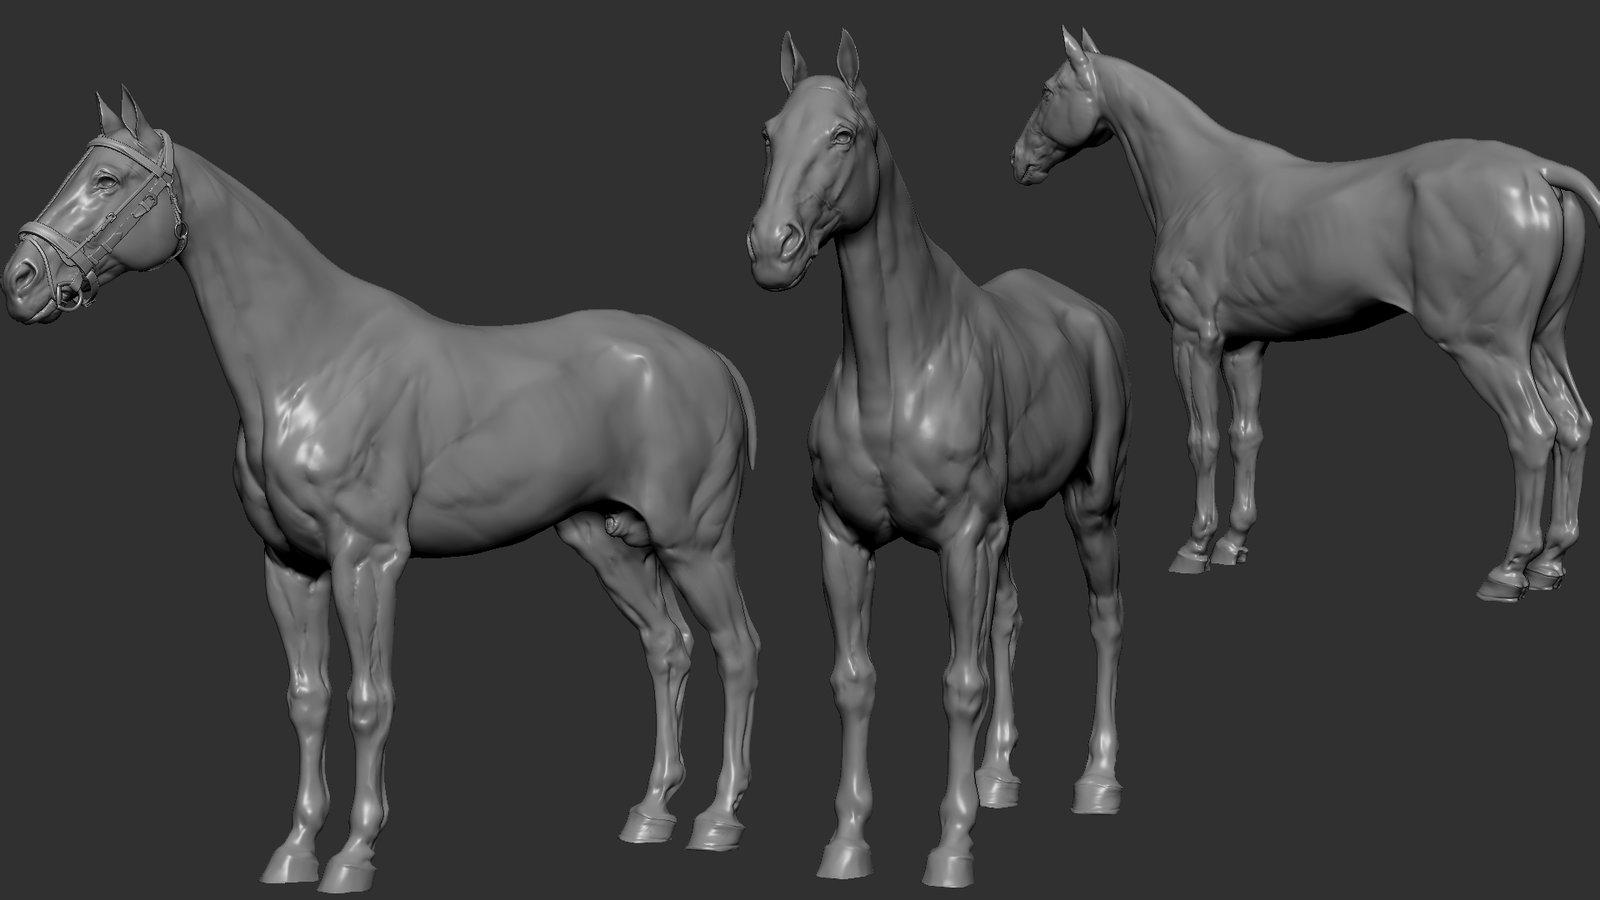 Sculpting the horse